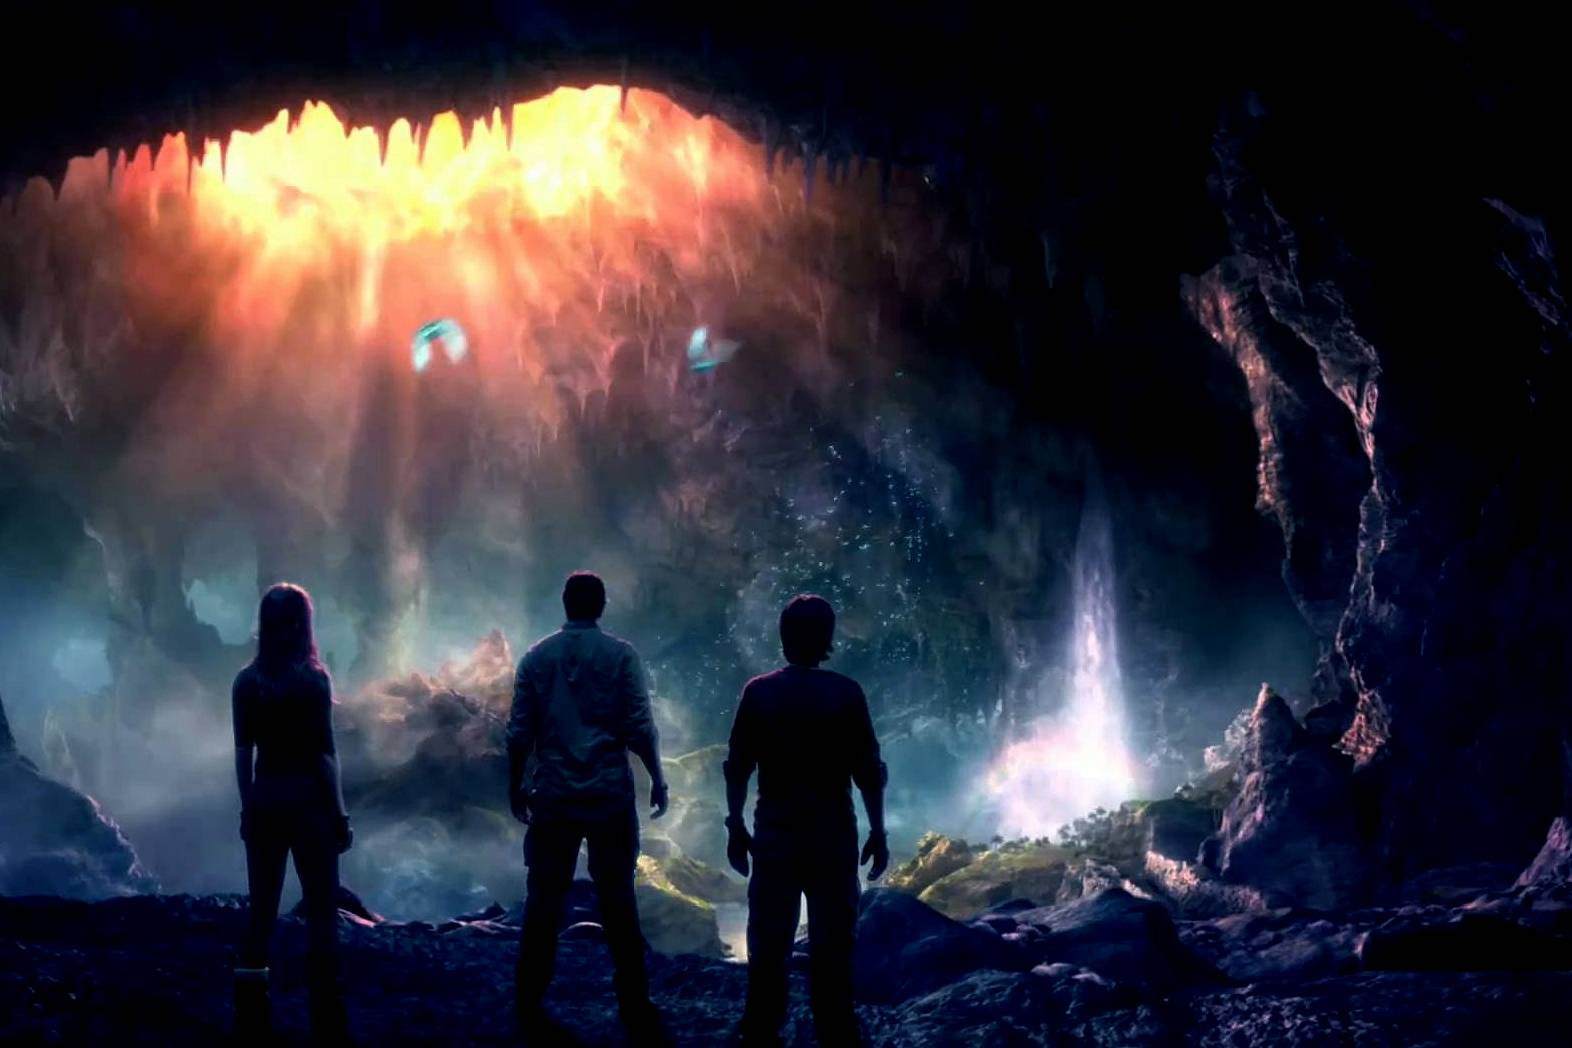 Viaje al centro de la Tierra (Documental) LSCHANNEL - FOTO: Youtube